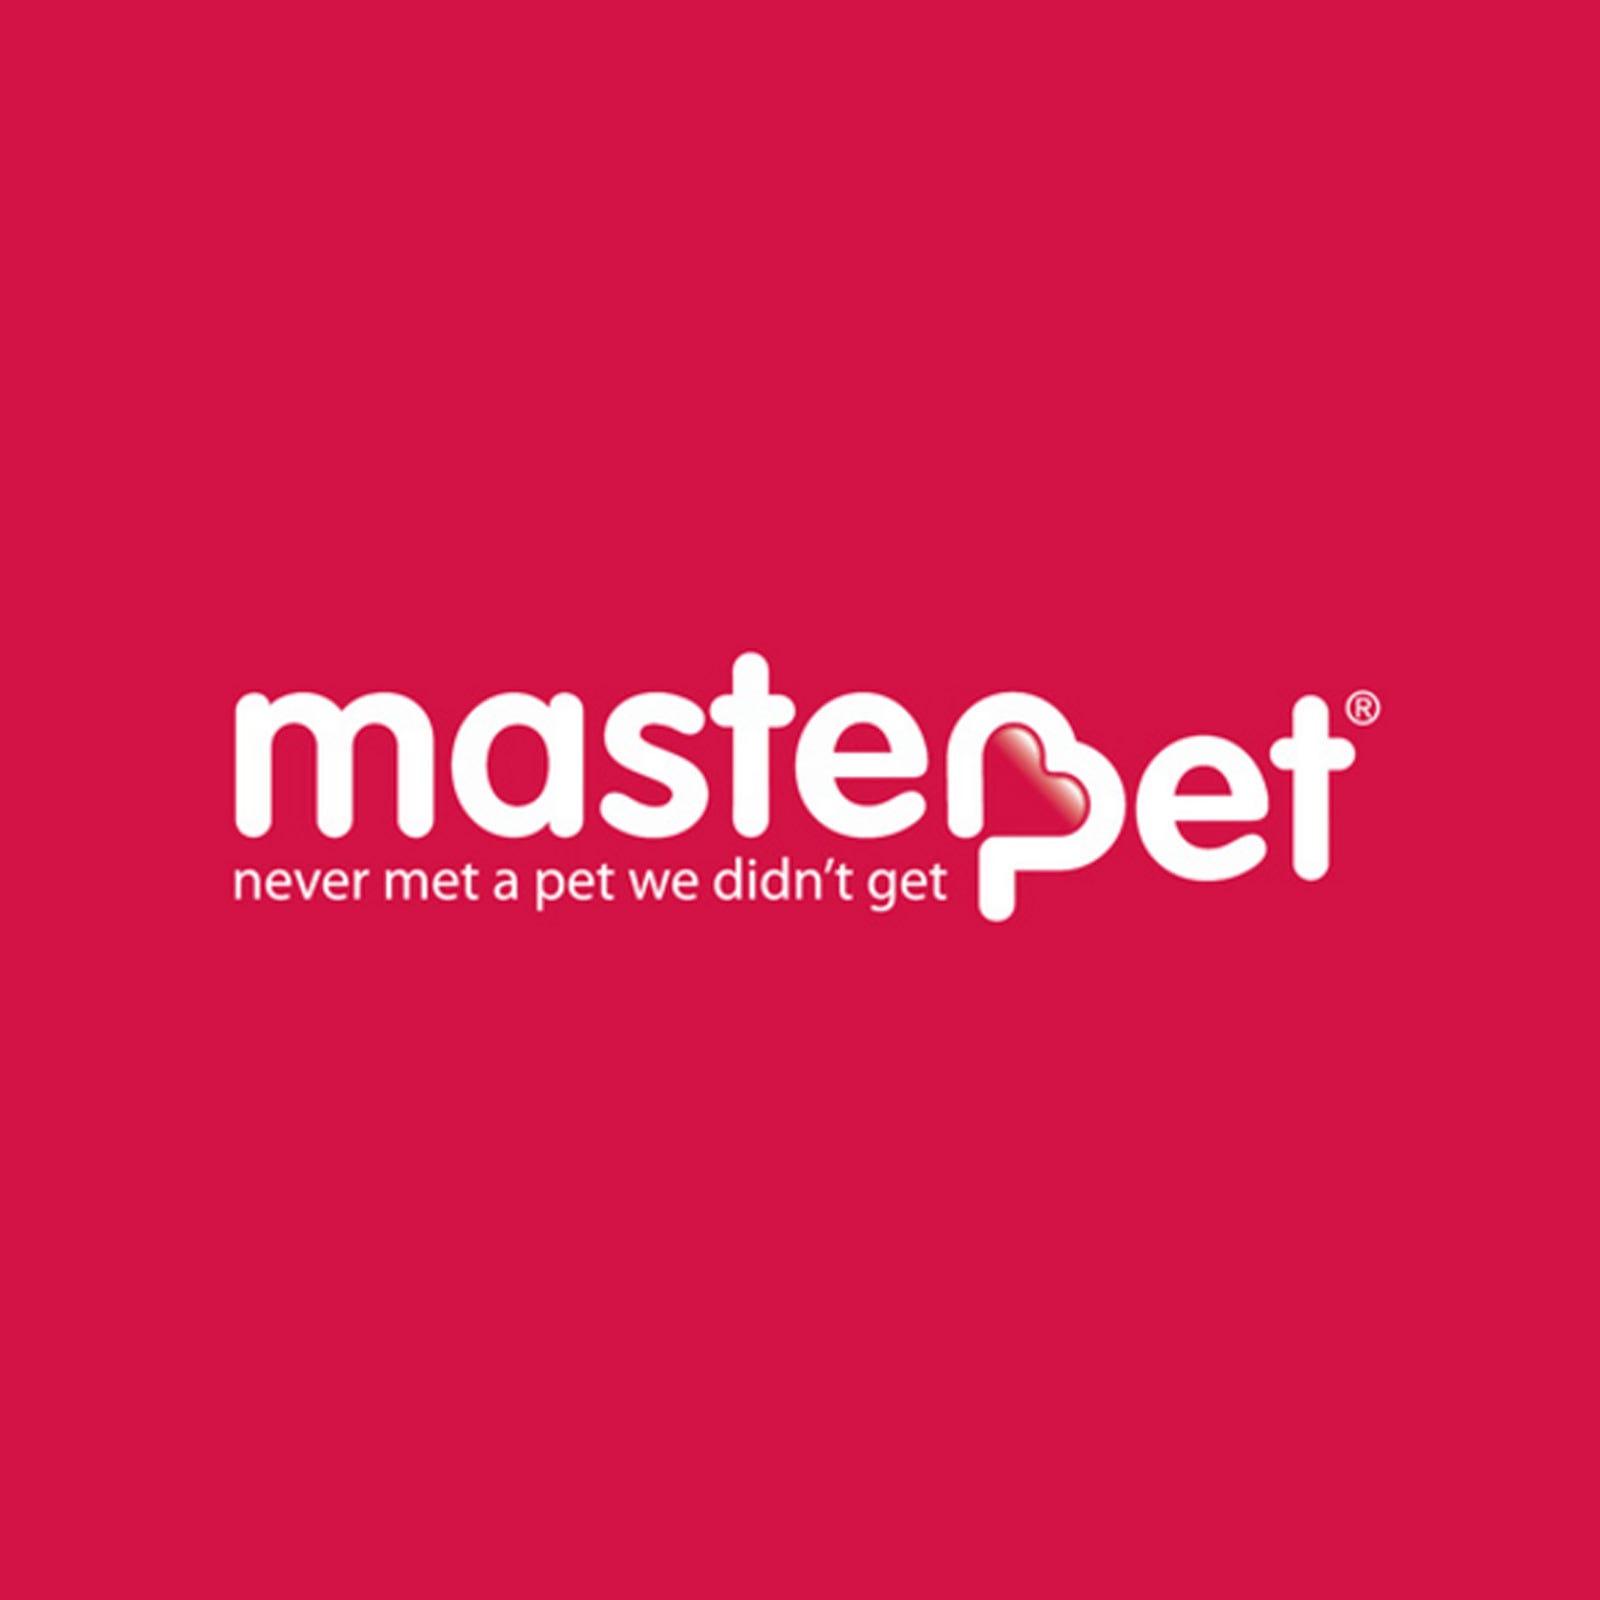 Masterpet